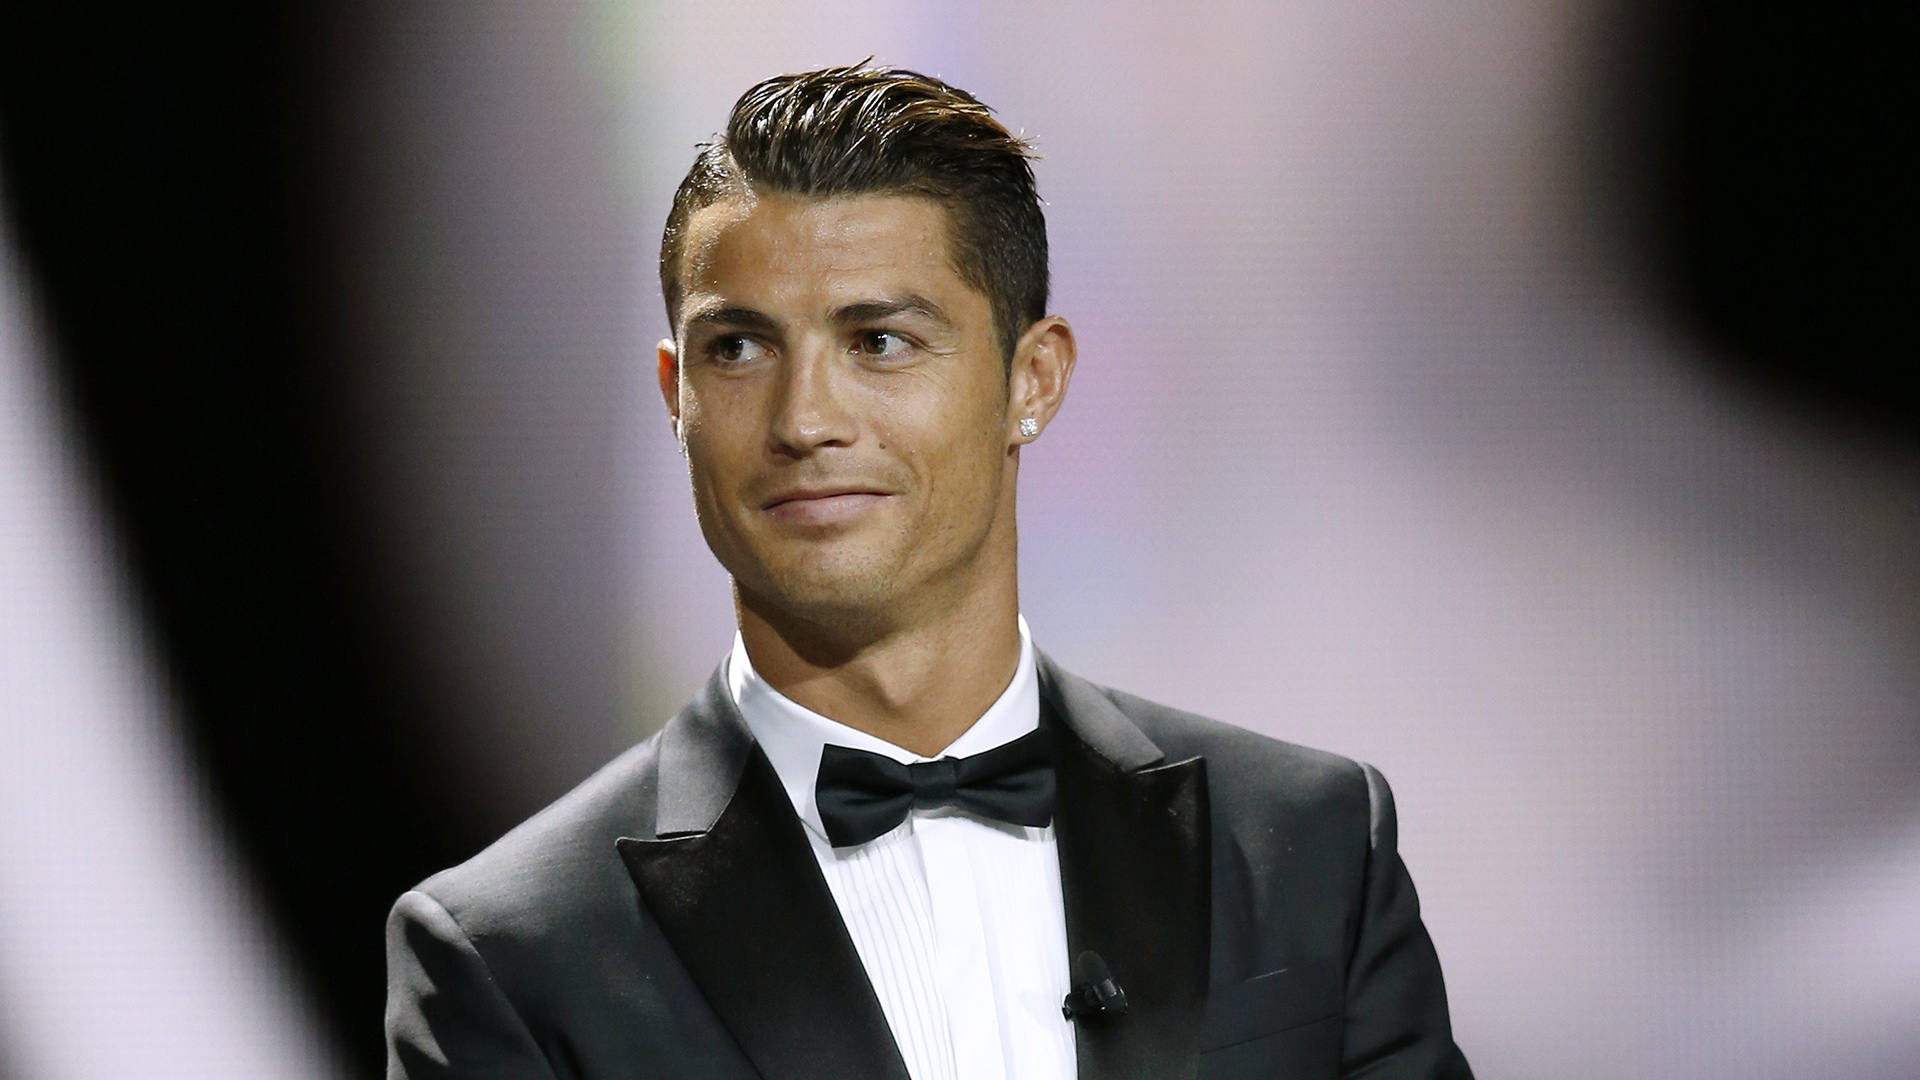 Pictures Of Cristiano Ronaldo